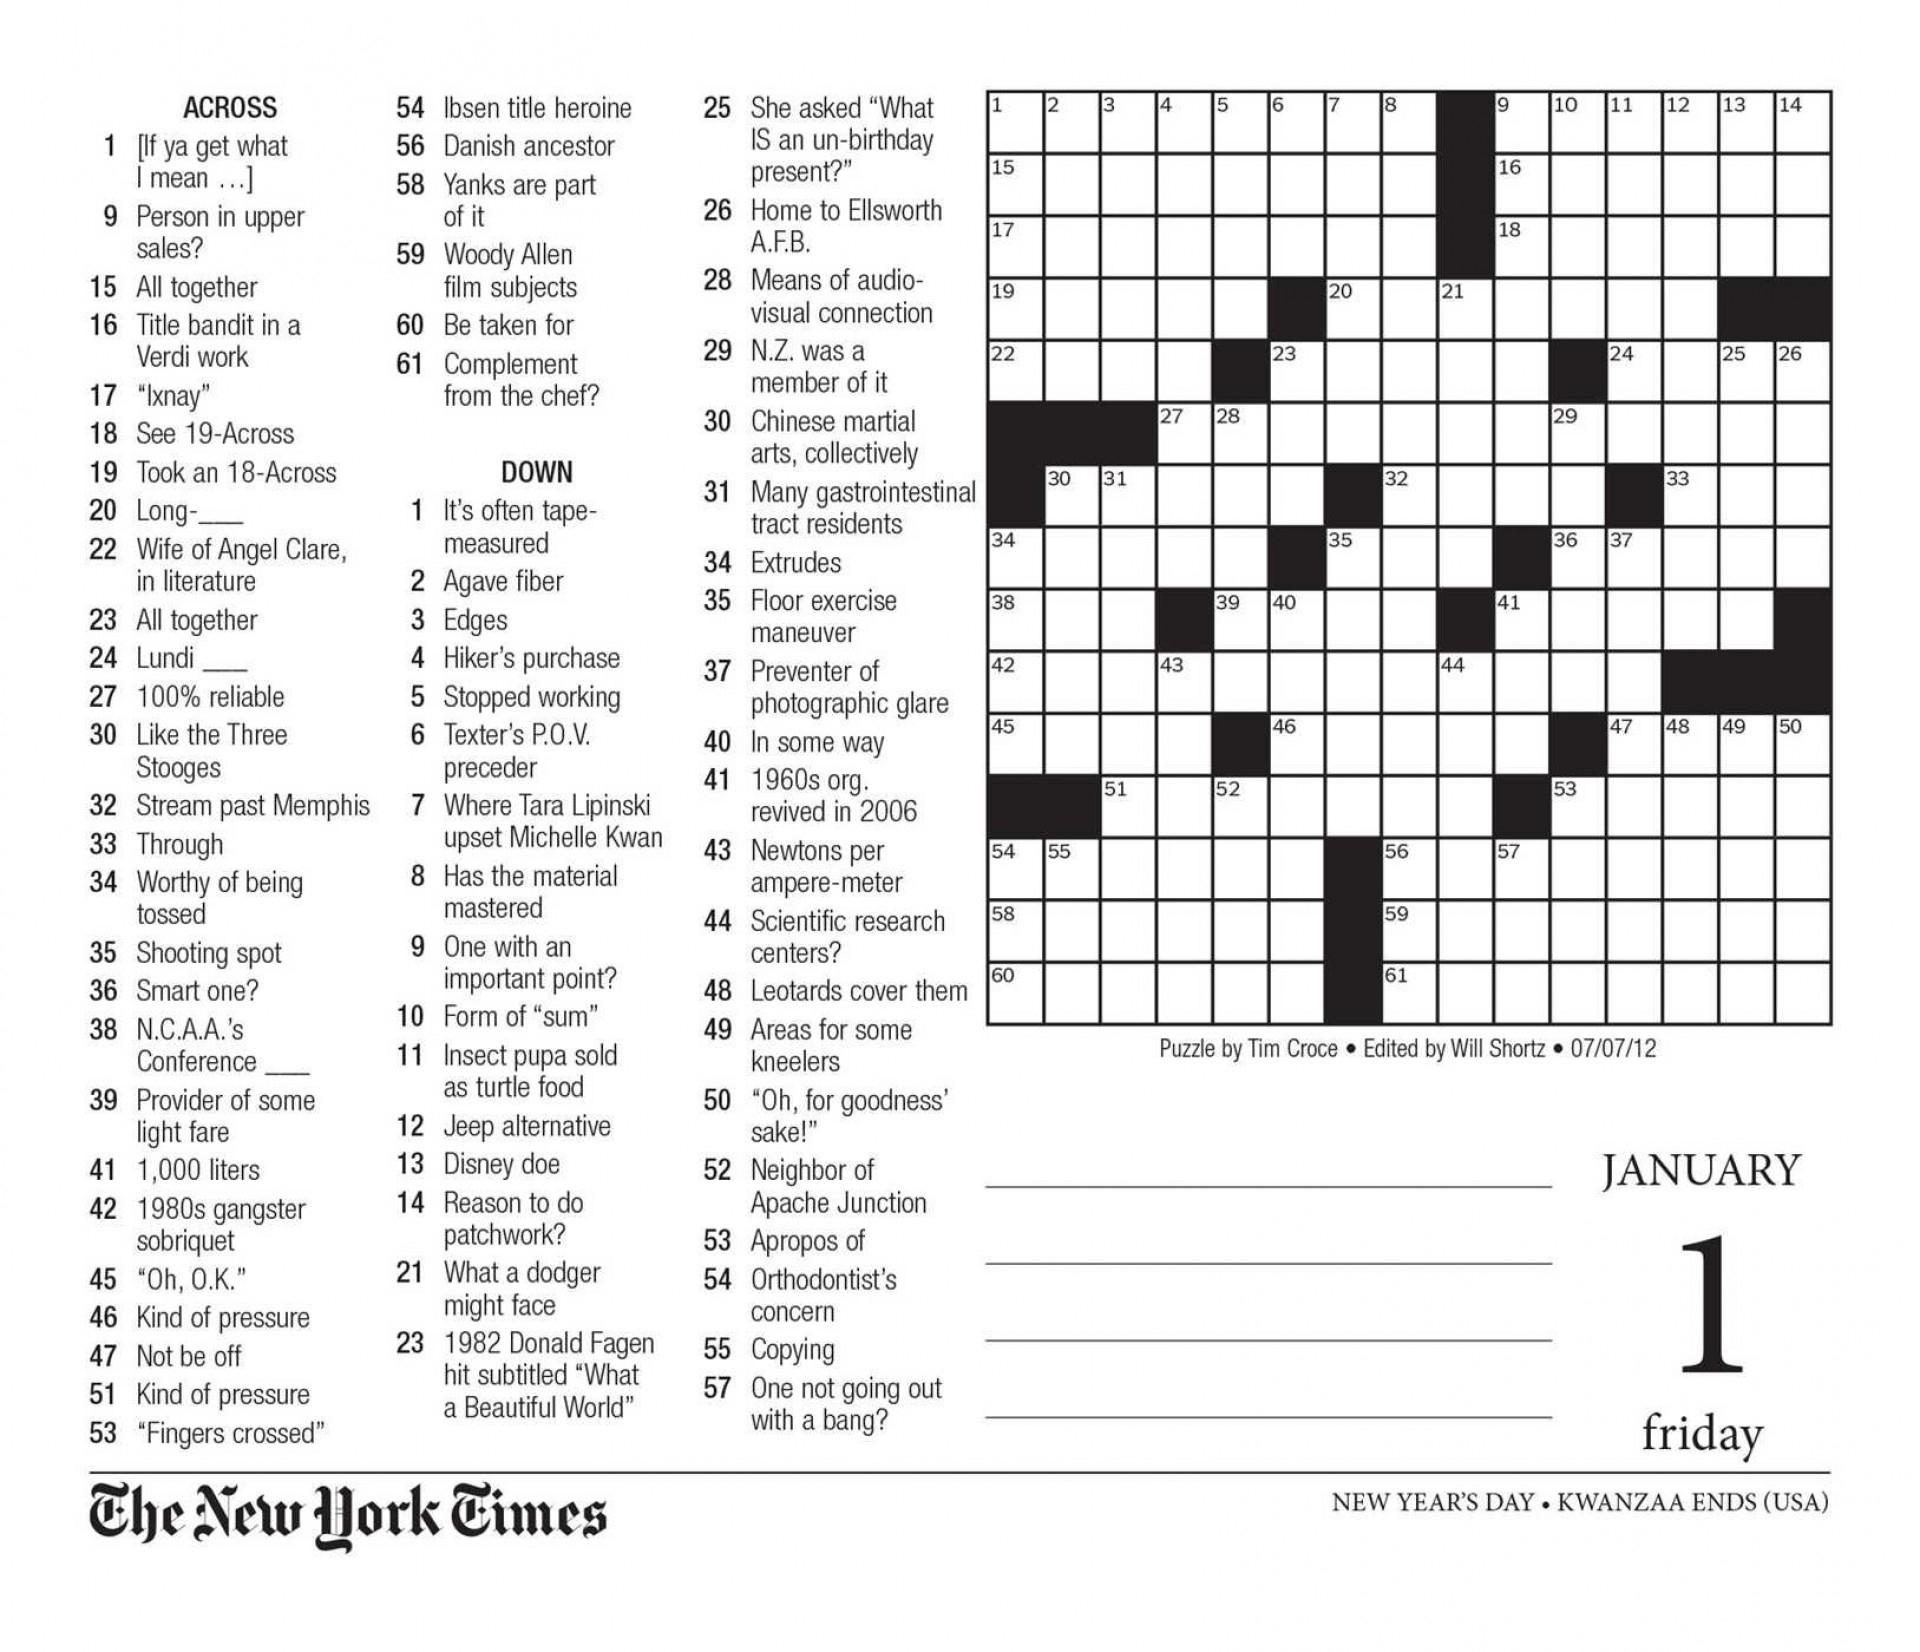 Free Printable Large Print Crossword Puzzles | M3U8 - Free Printable - Printable Giant Crossword Puzzles